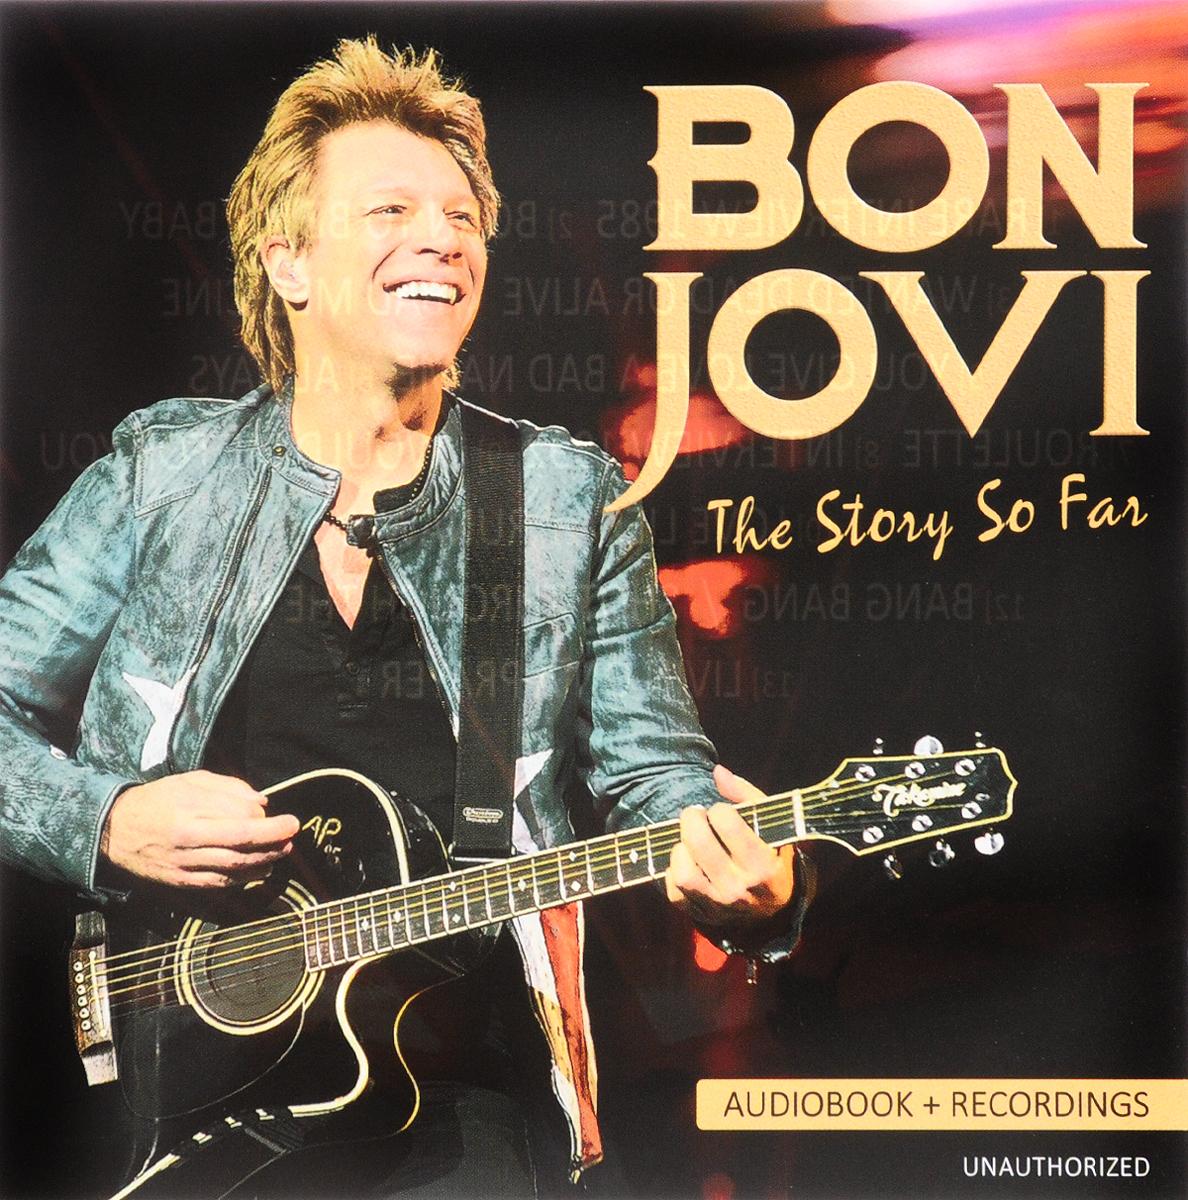 Bon Jovi Bon Jovi. The Story So Far bon jovi autographed signed 8 x 10 rp photo mint condition